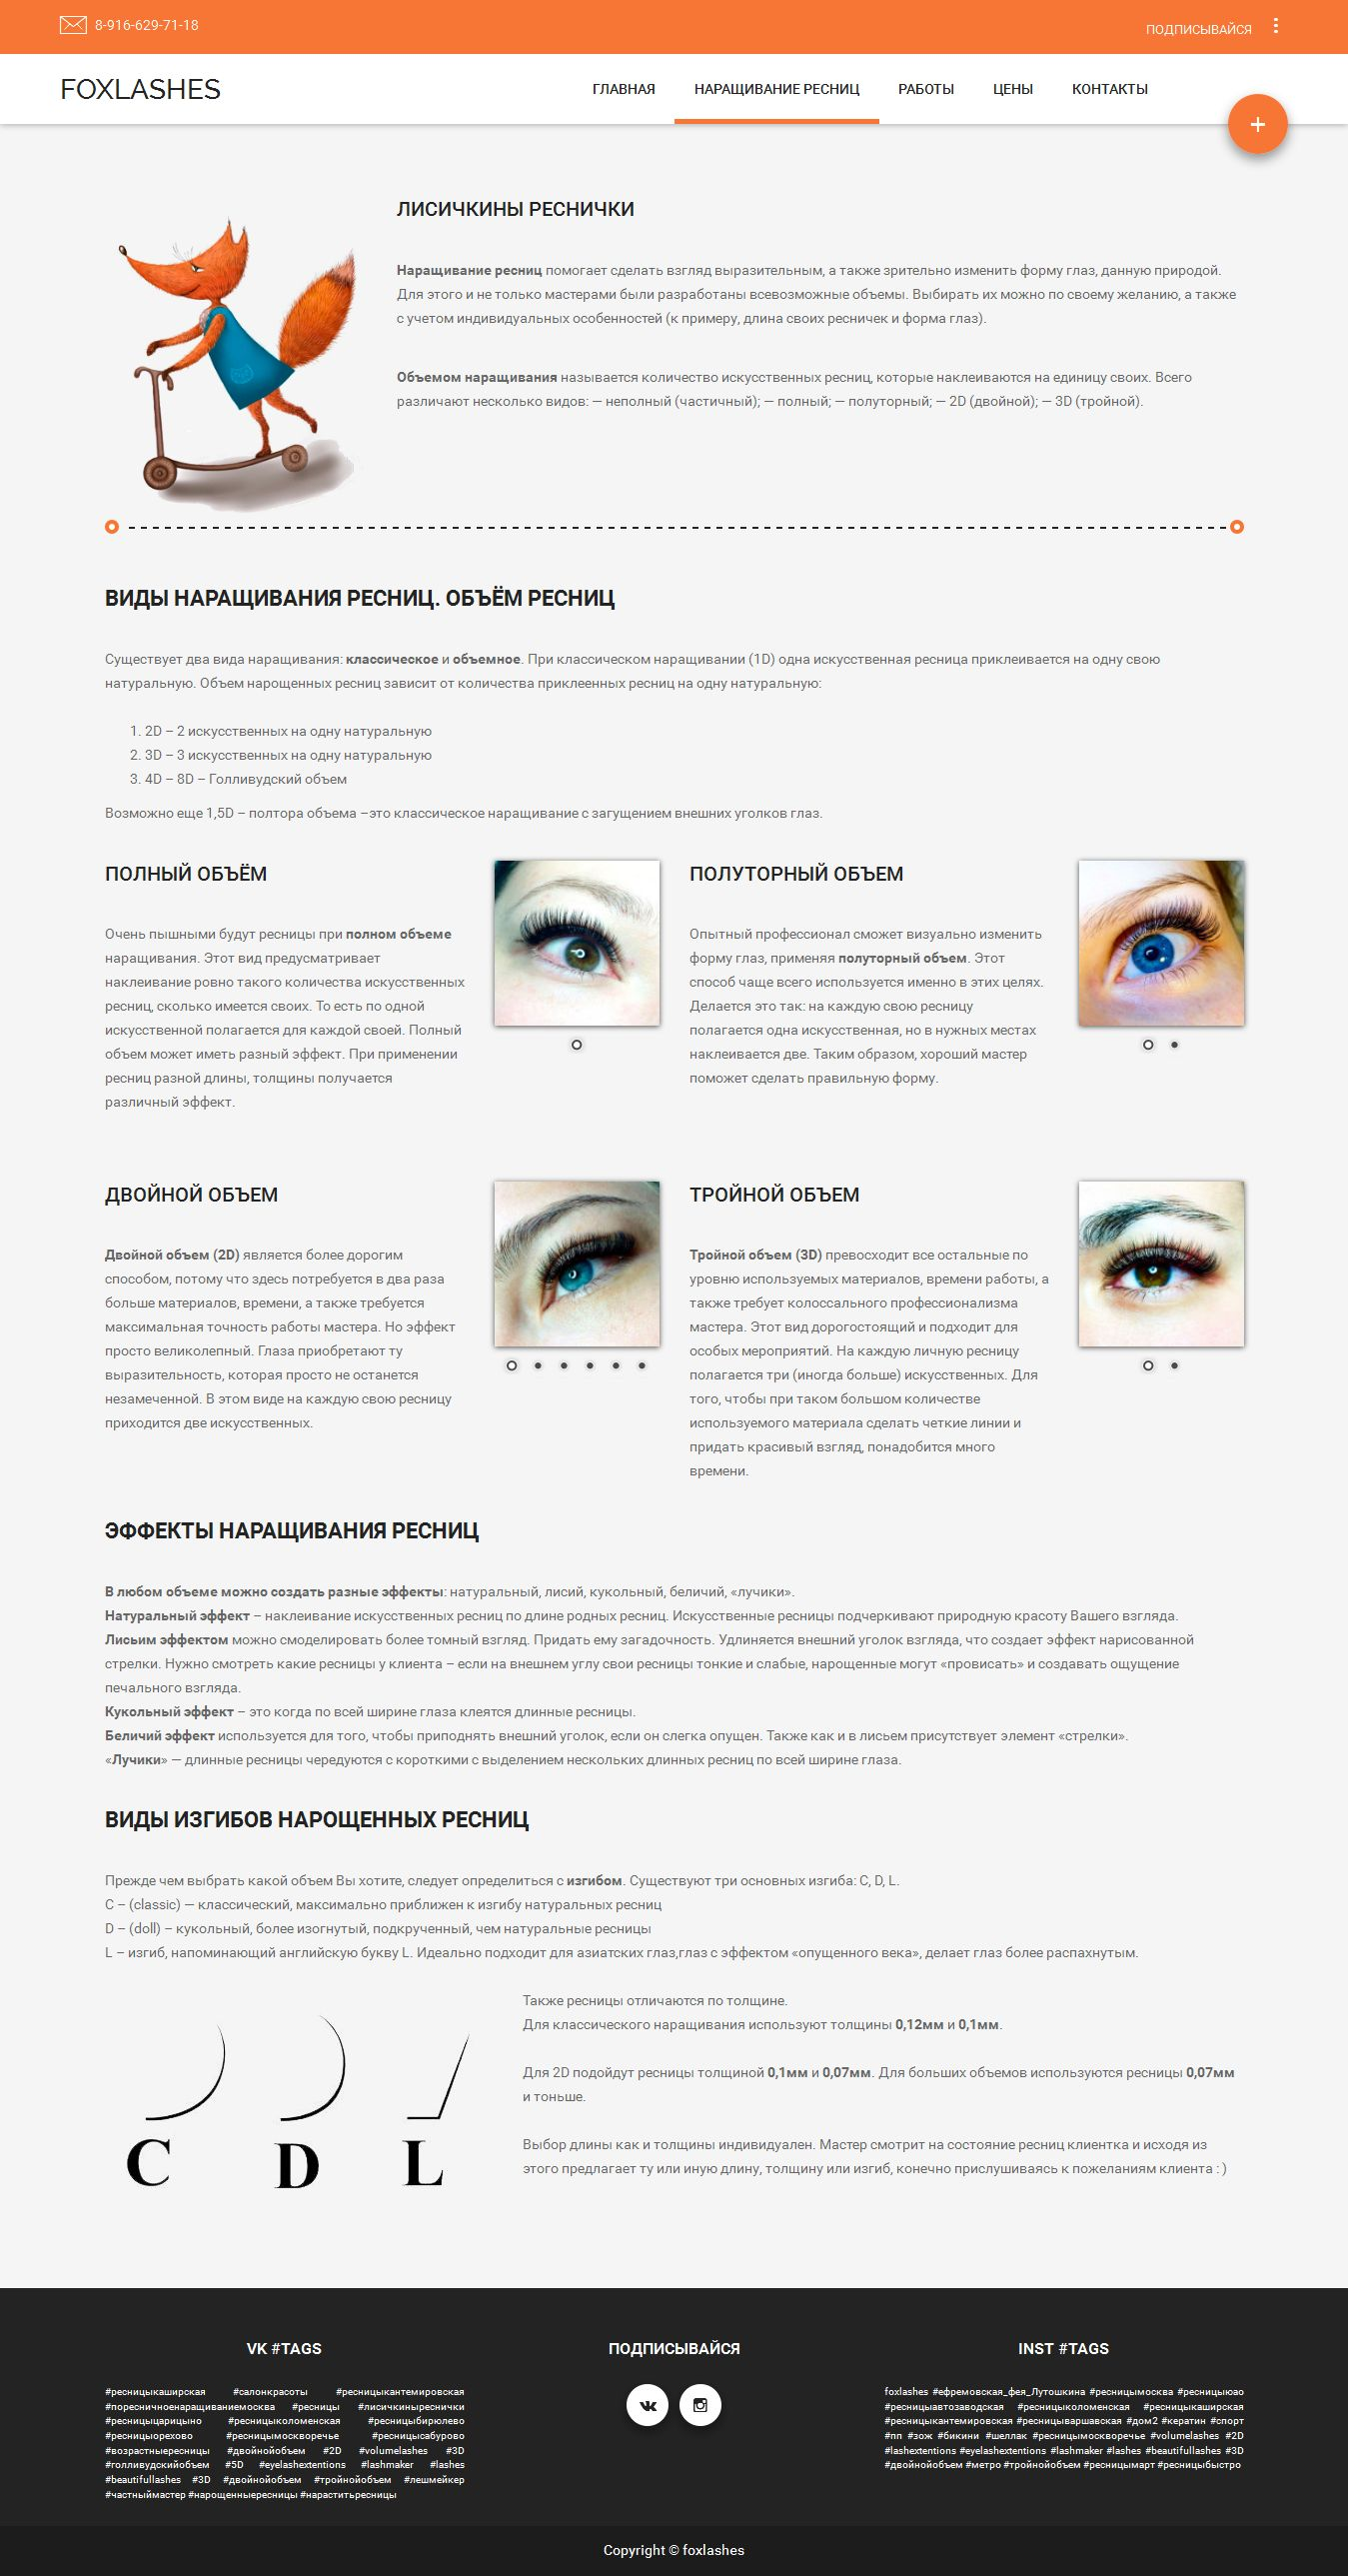 Пример сайта визитки - наращивание ресниц - foxlashes - описание услуг